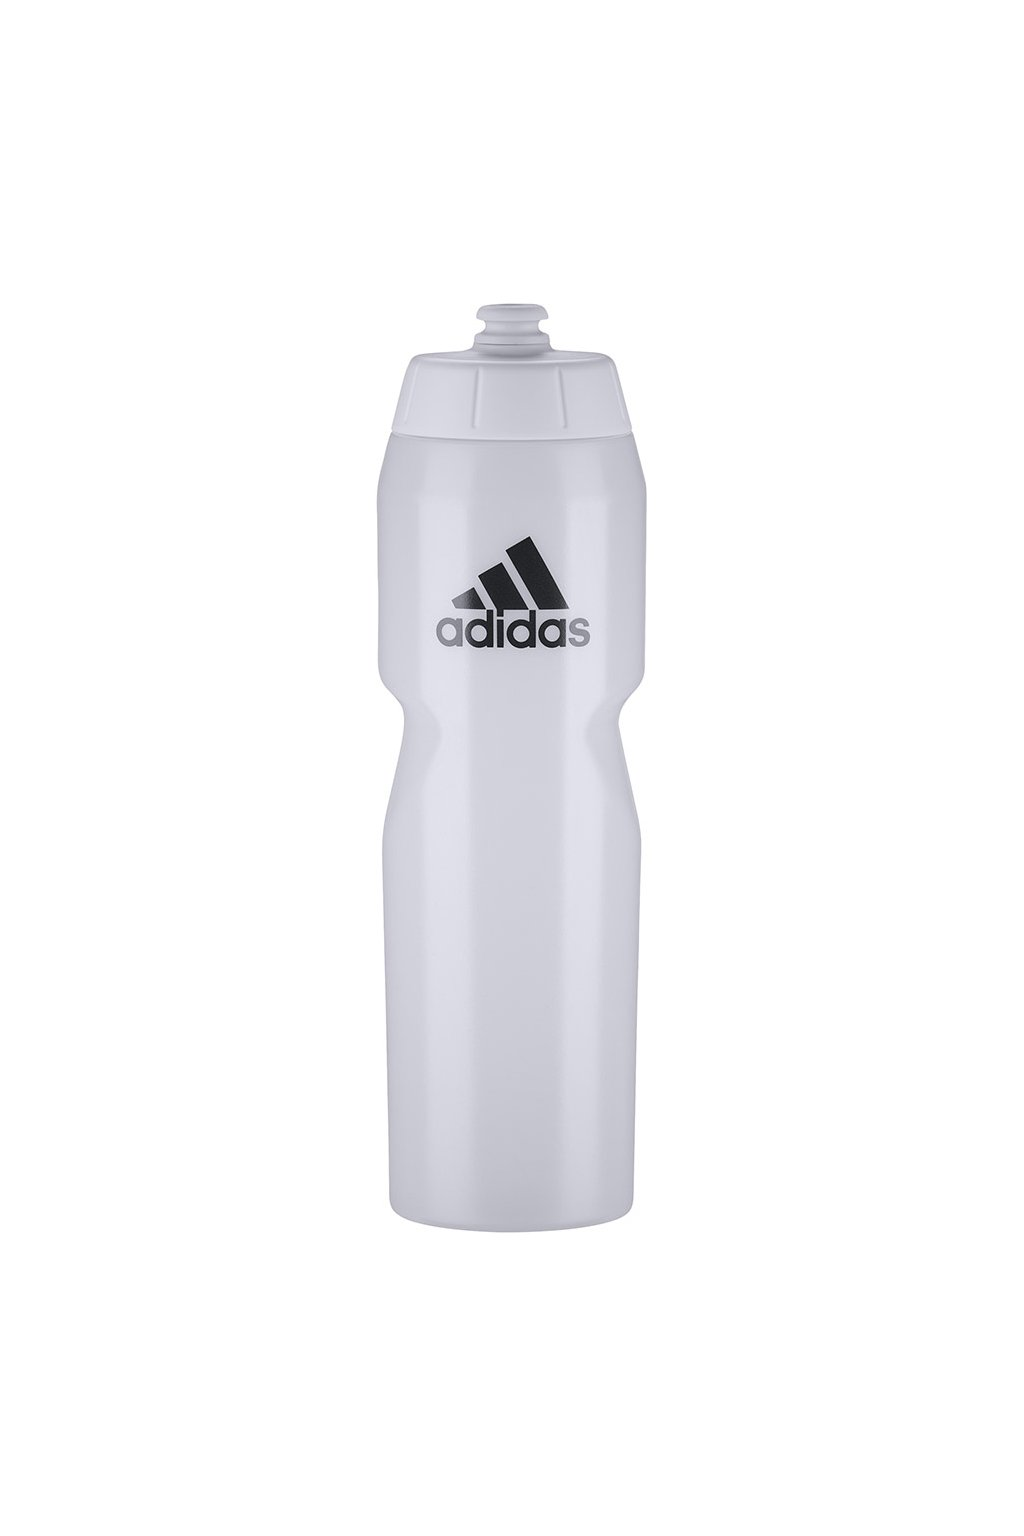 Fľaša Adidas Performance Bottle 750 ml priesvitná FT8941